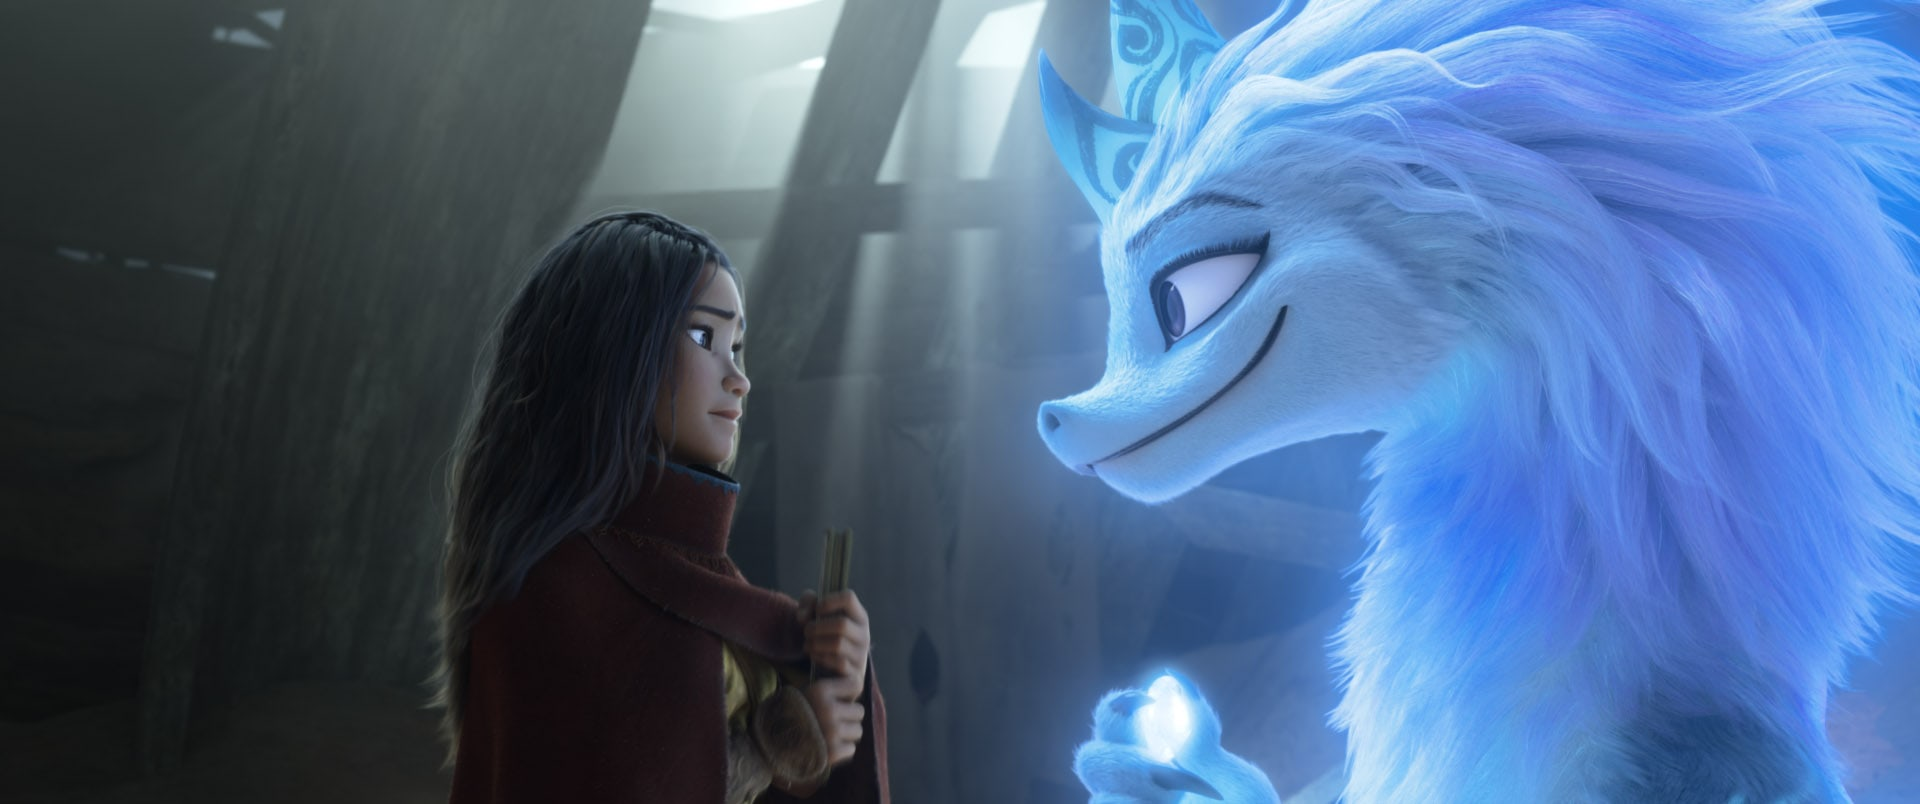 Raya and the Last Dragon Giveaway